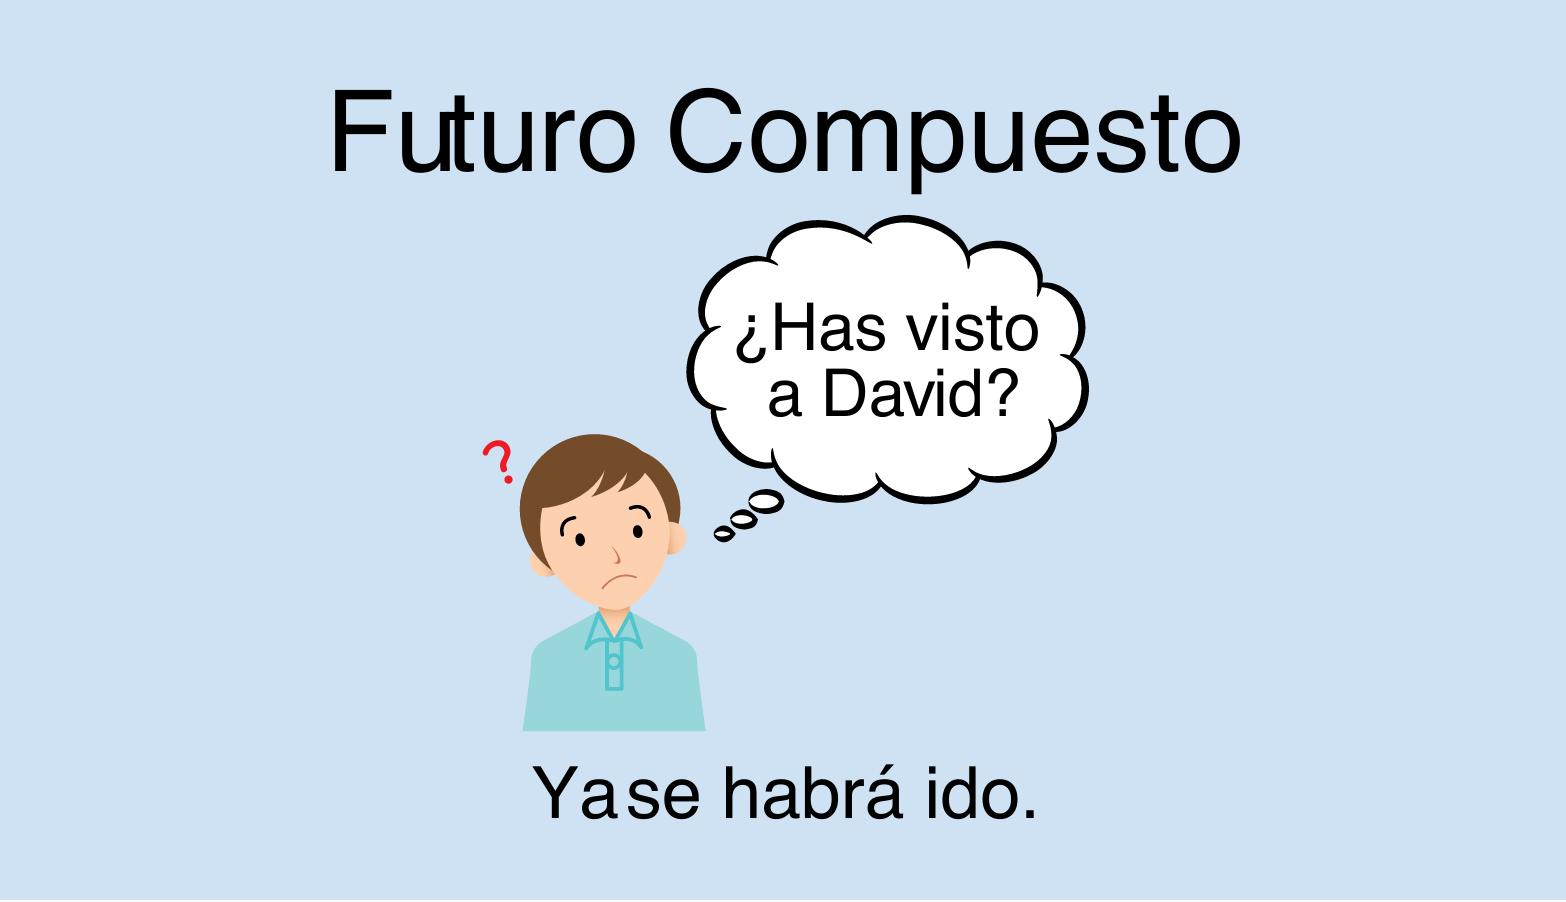 Futur II im Spanischen (futuro compuesto)